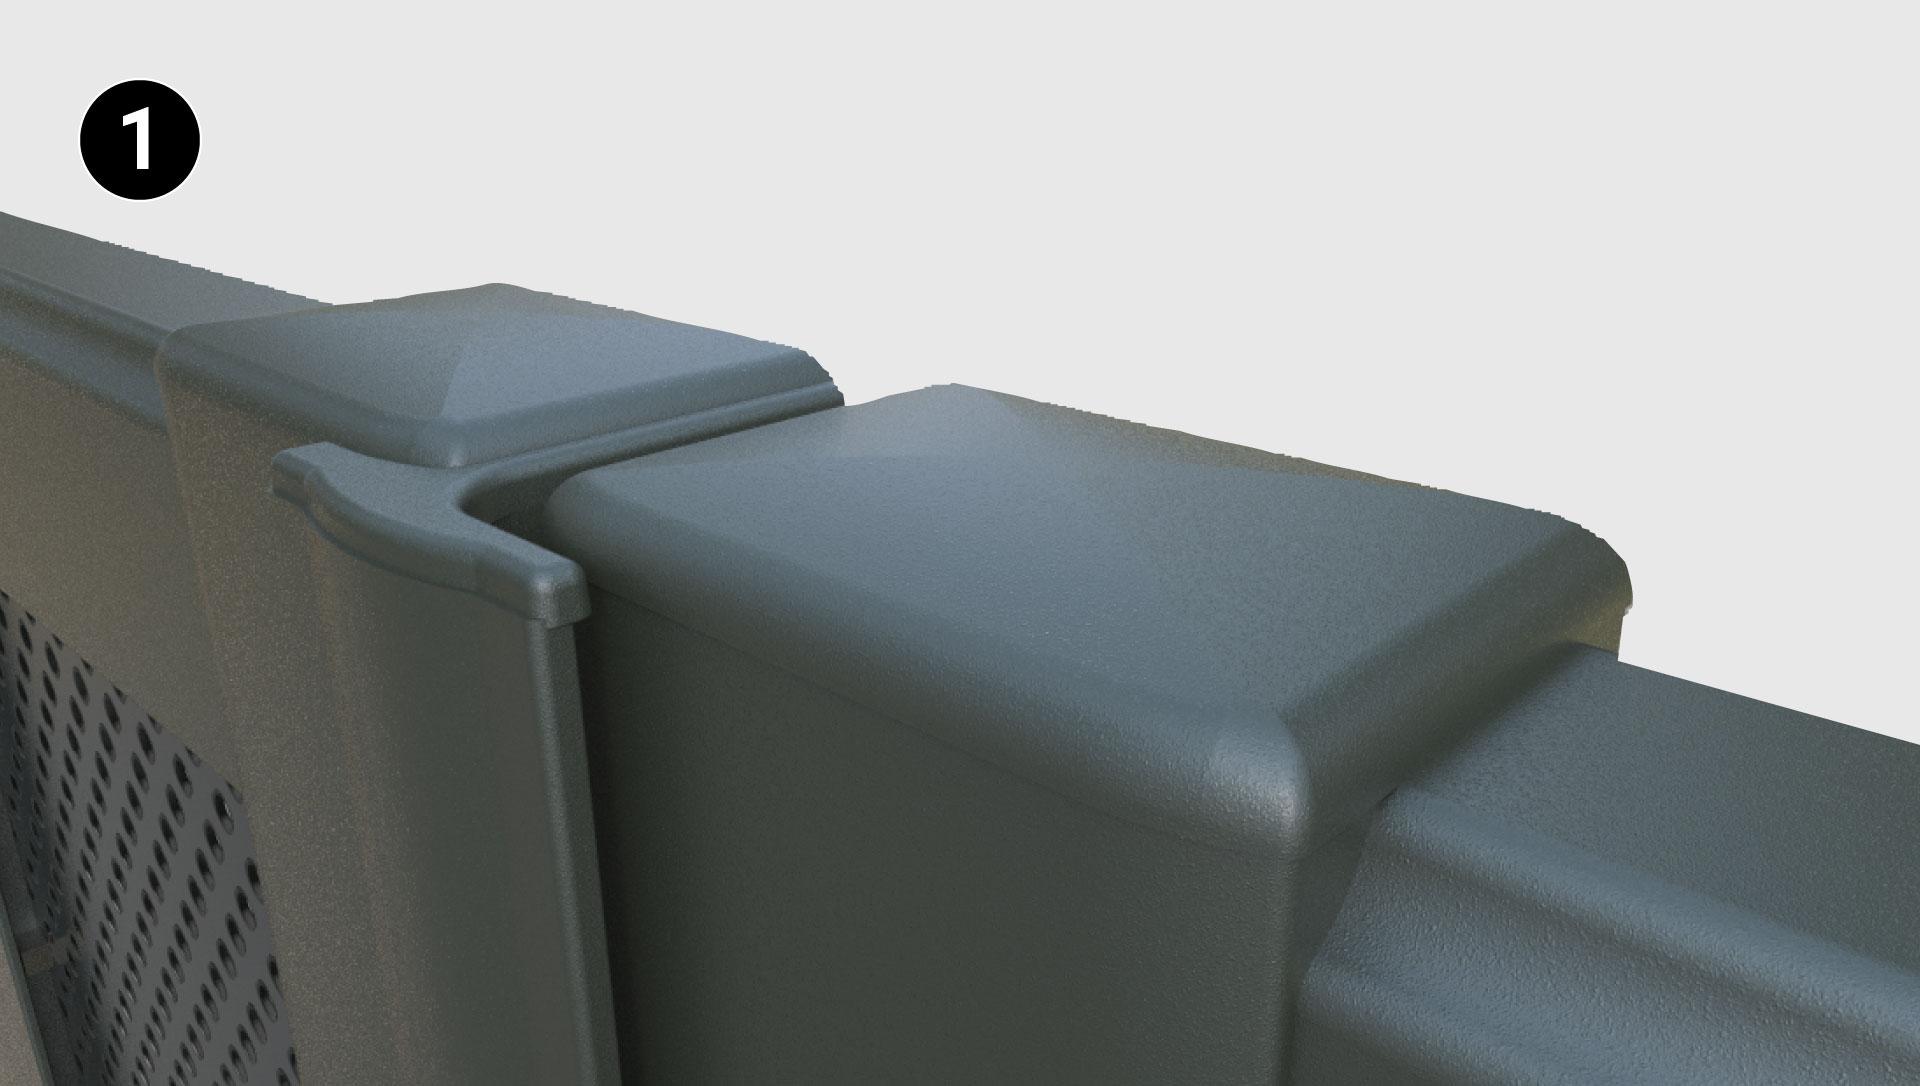 Bouchons en aluminium assortis au portail